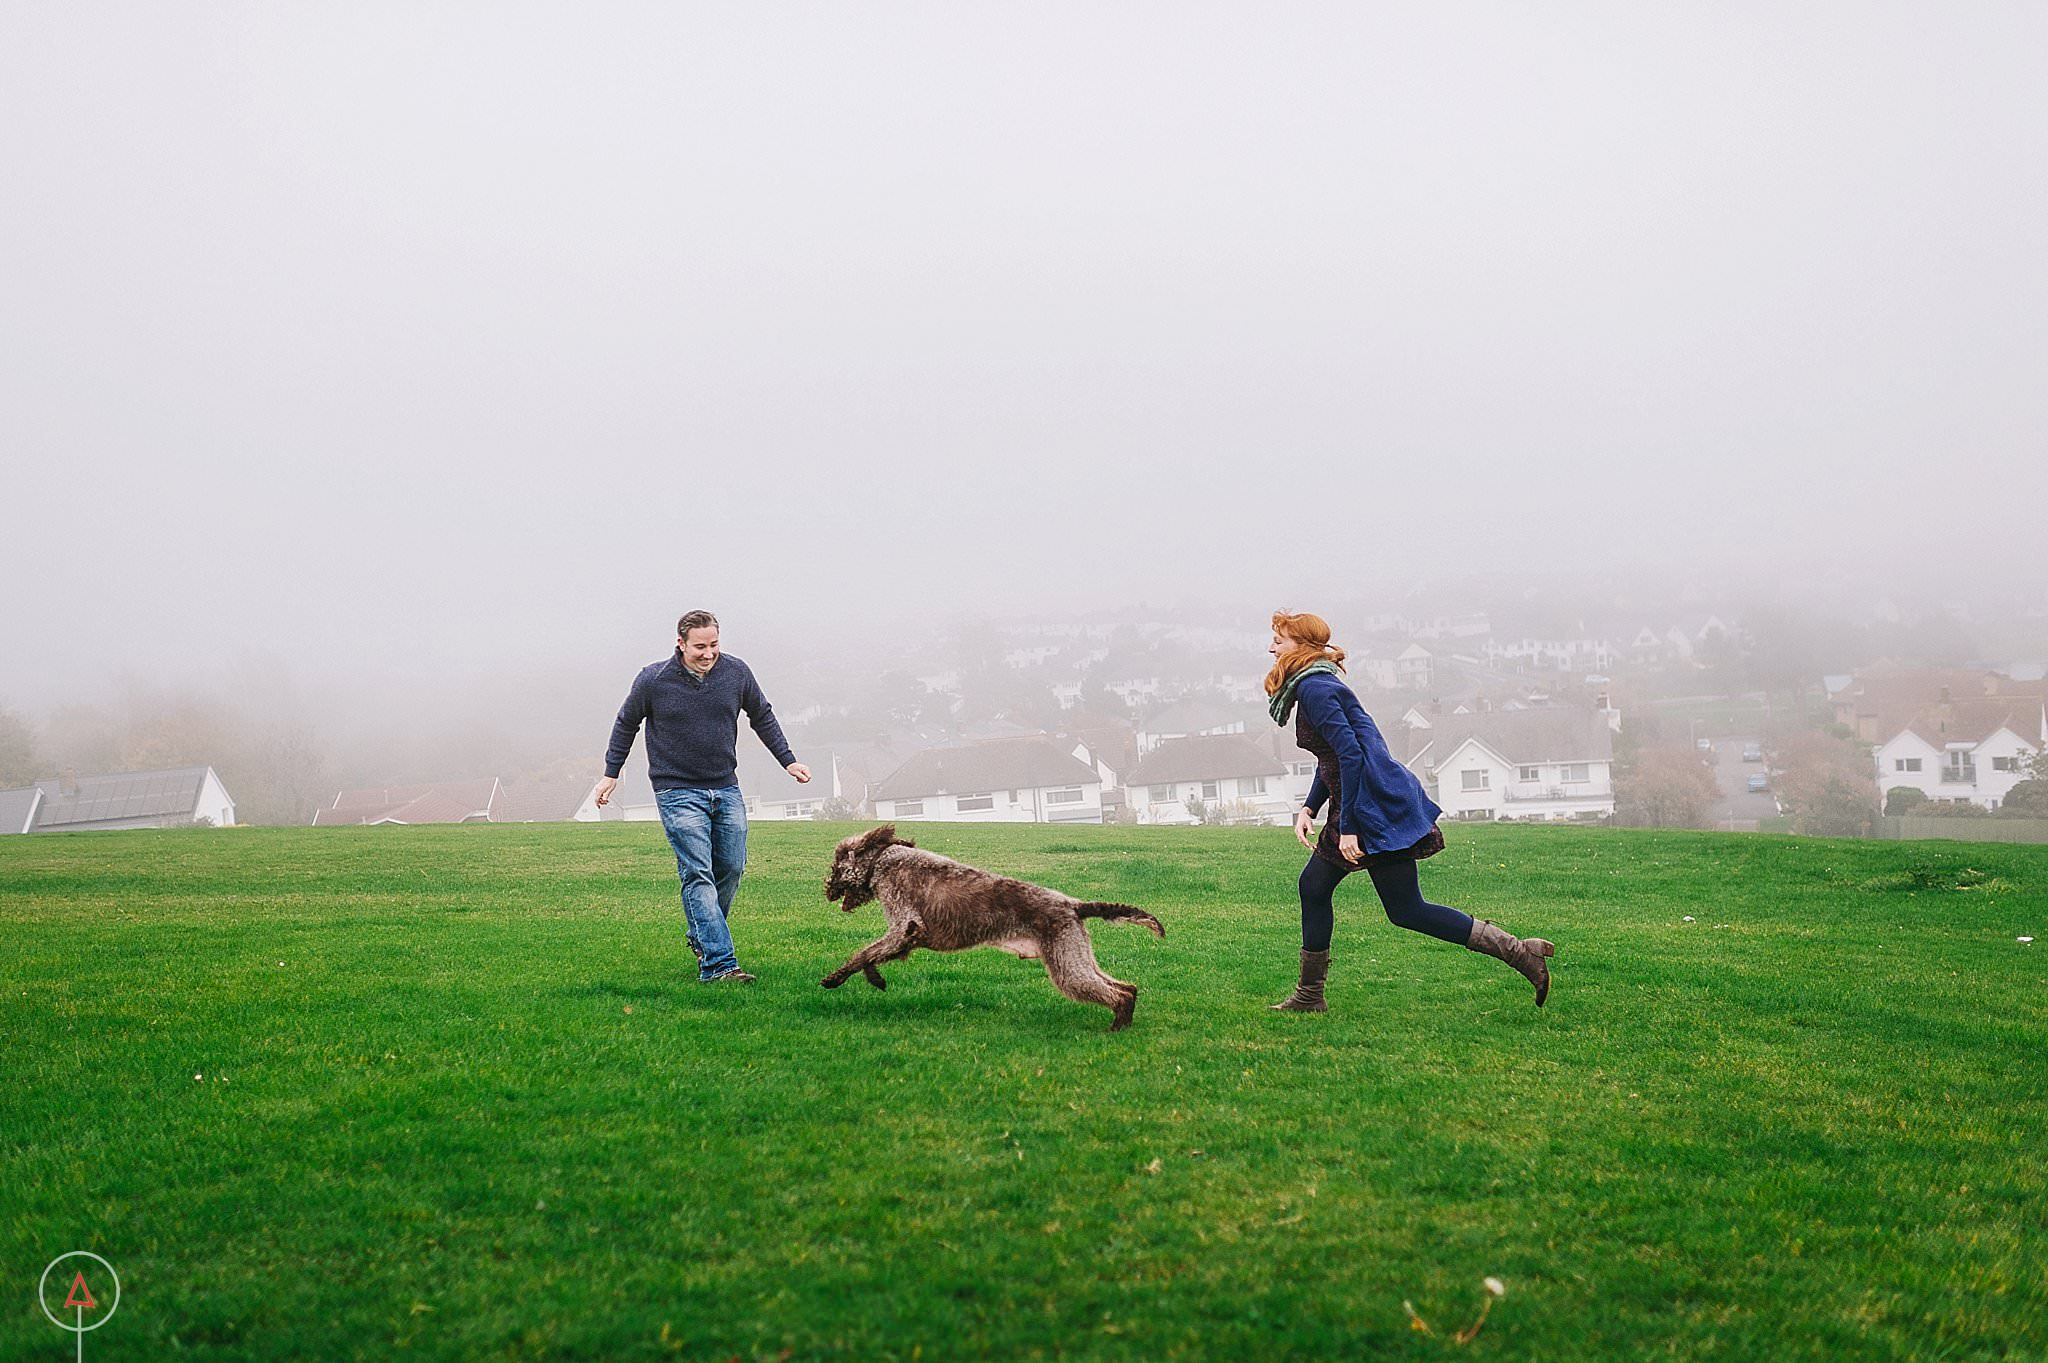 South-Wales-Pre-Wedding-Photography-Aga-Tomaszek-00015